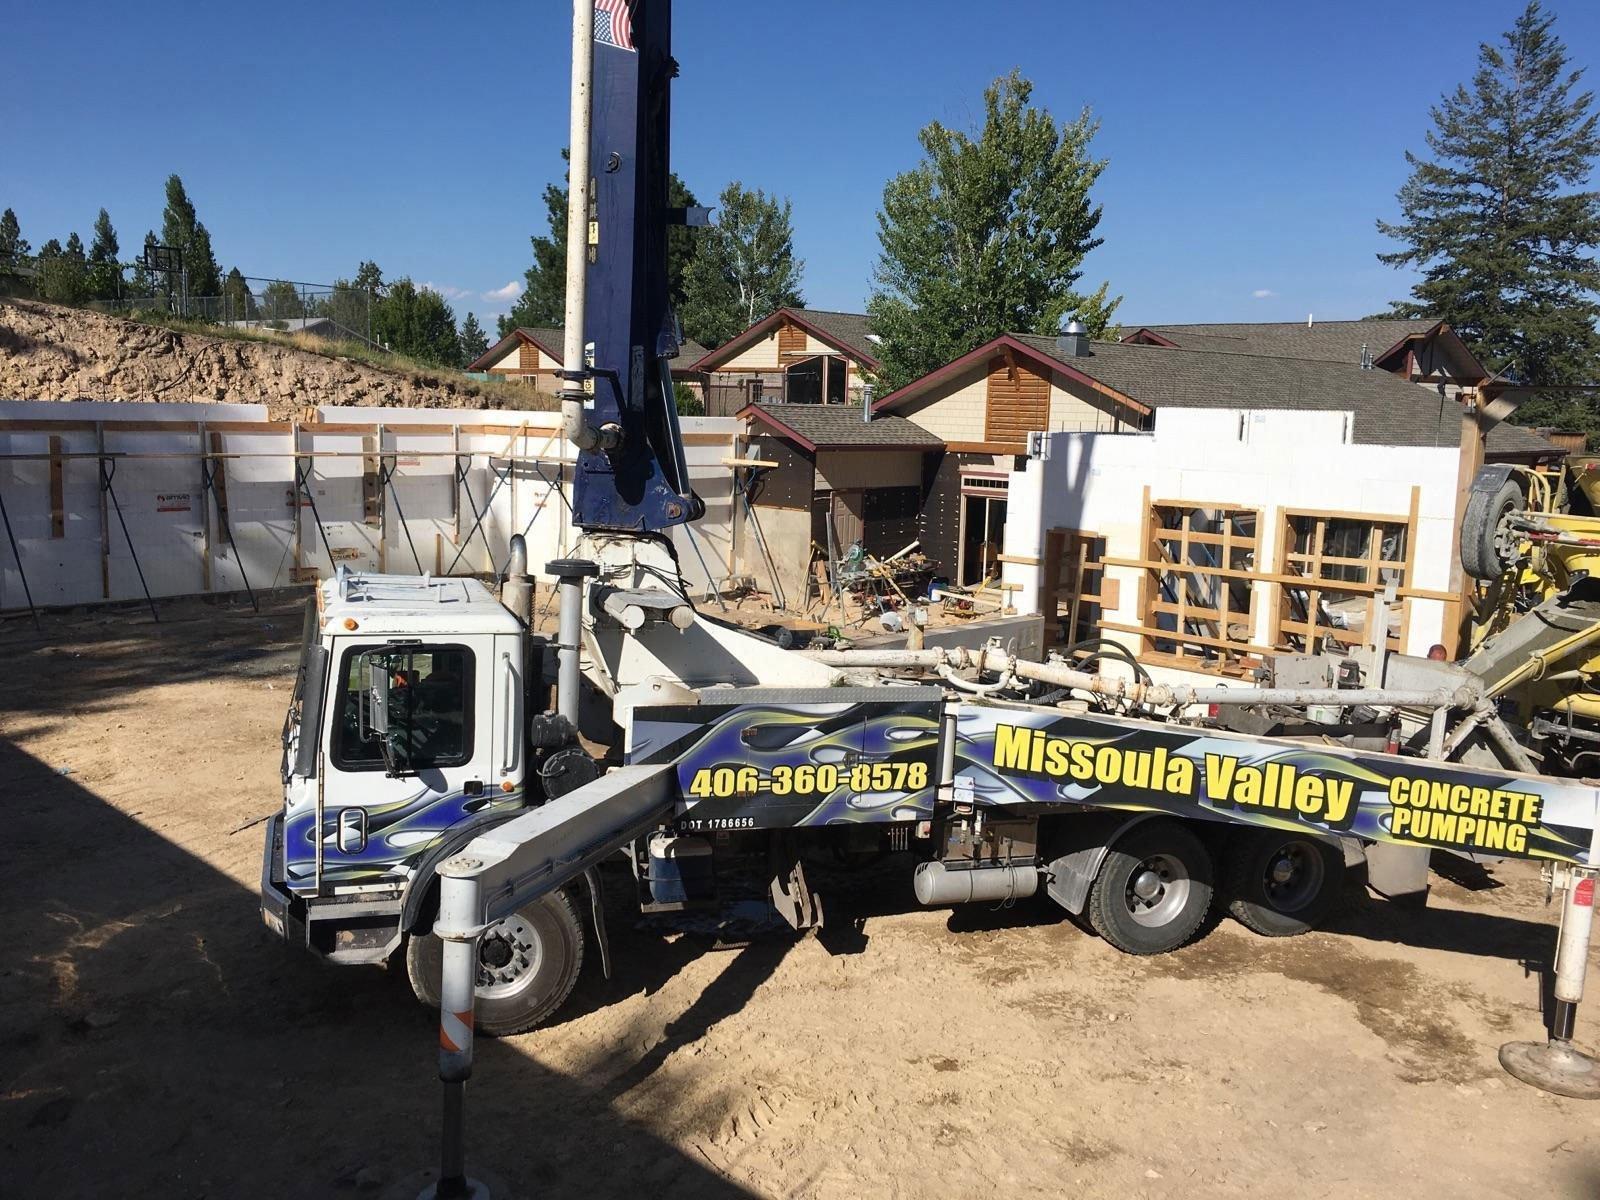 Missoula Valley Concrete Pumping Photo Gallery | Missoula MT